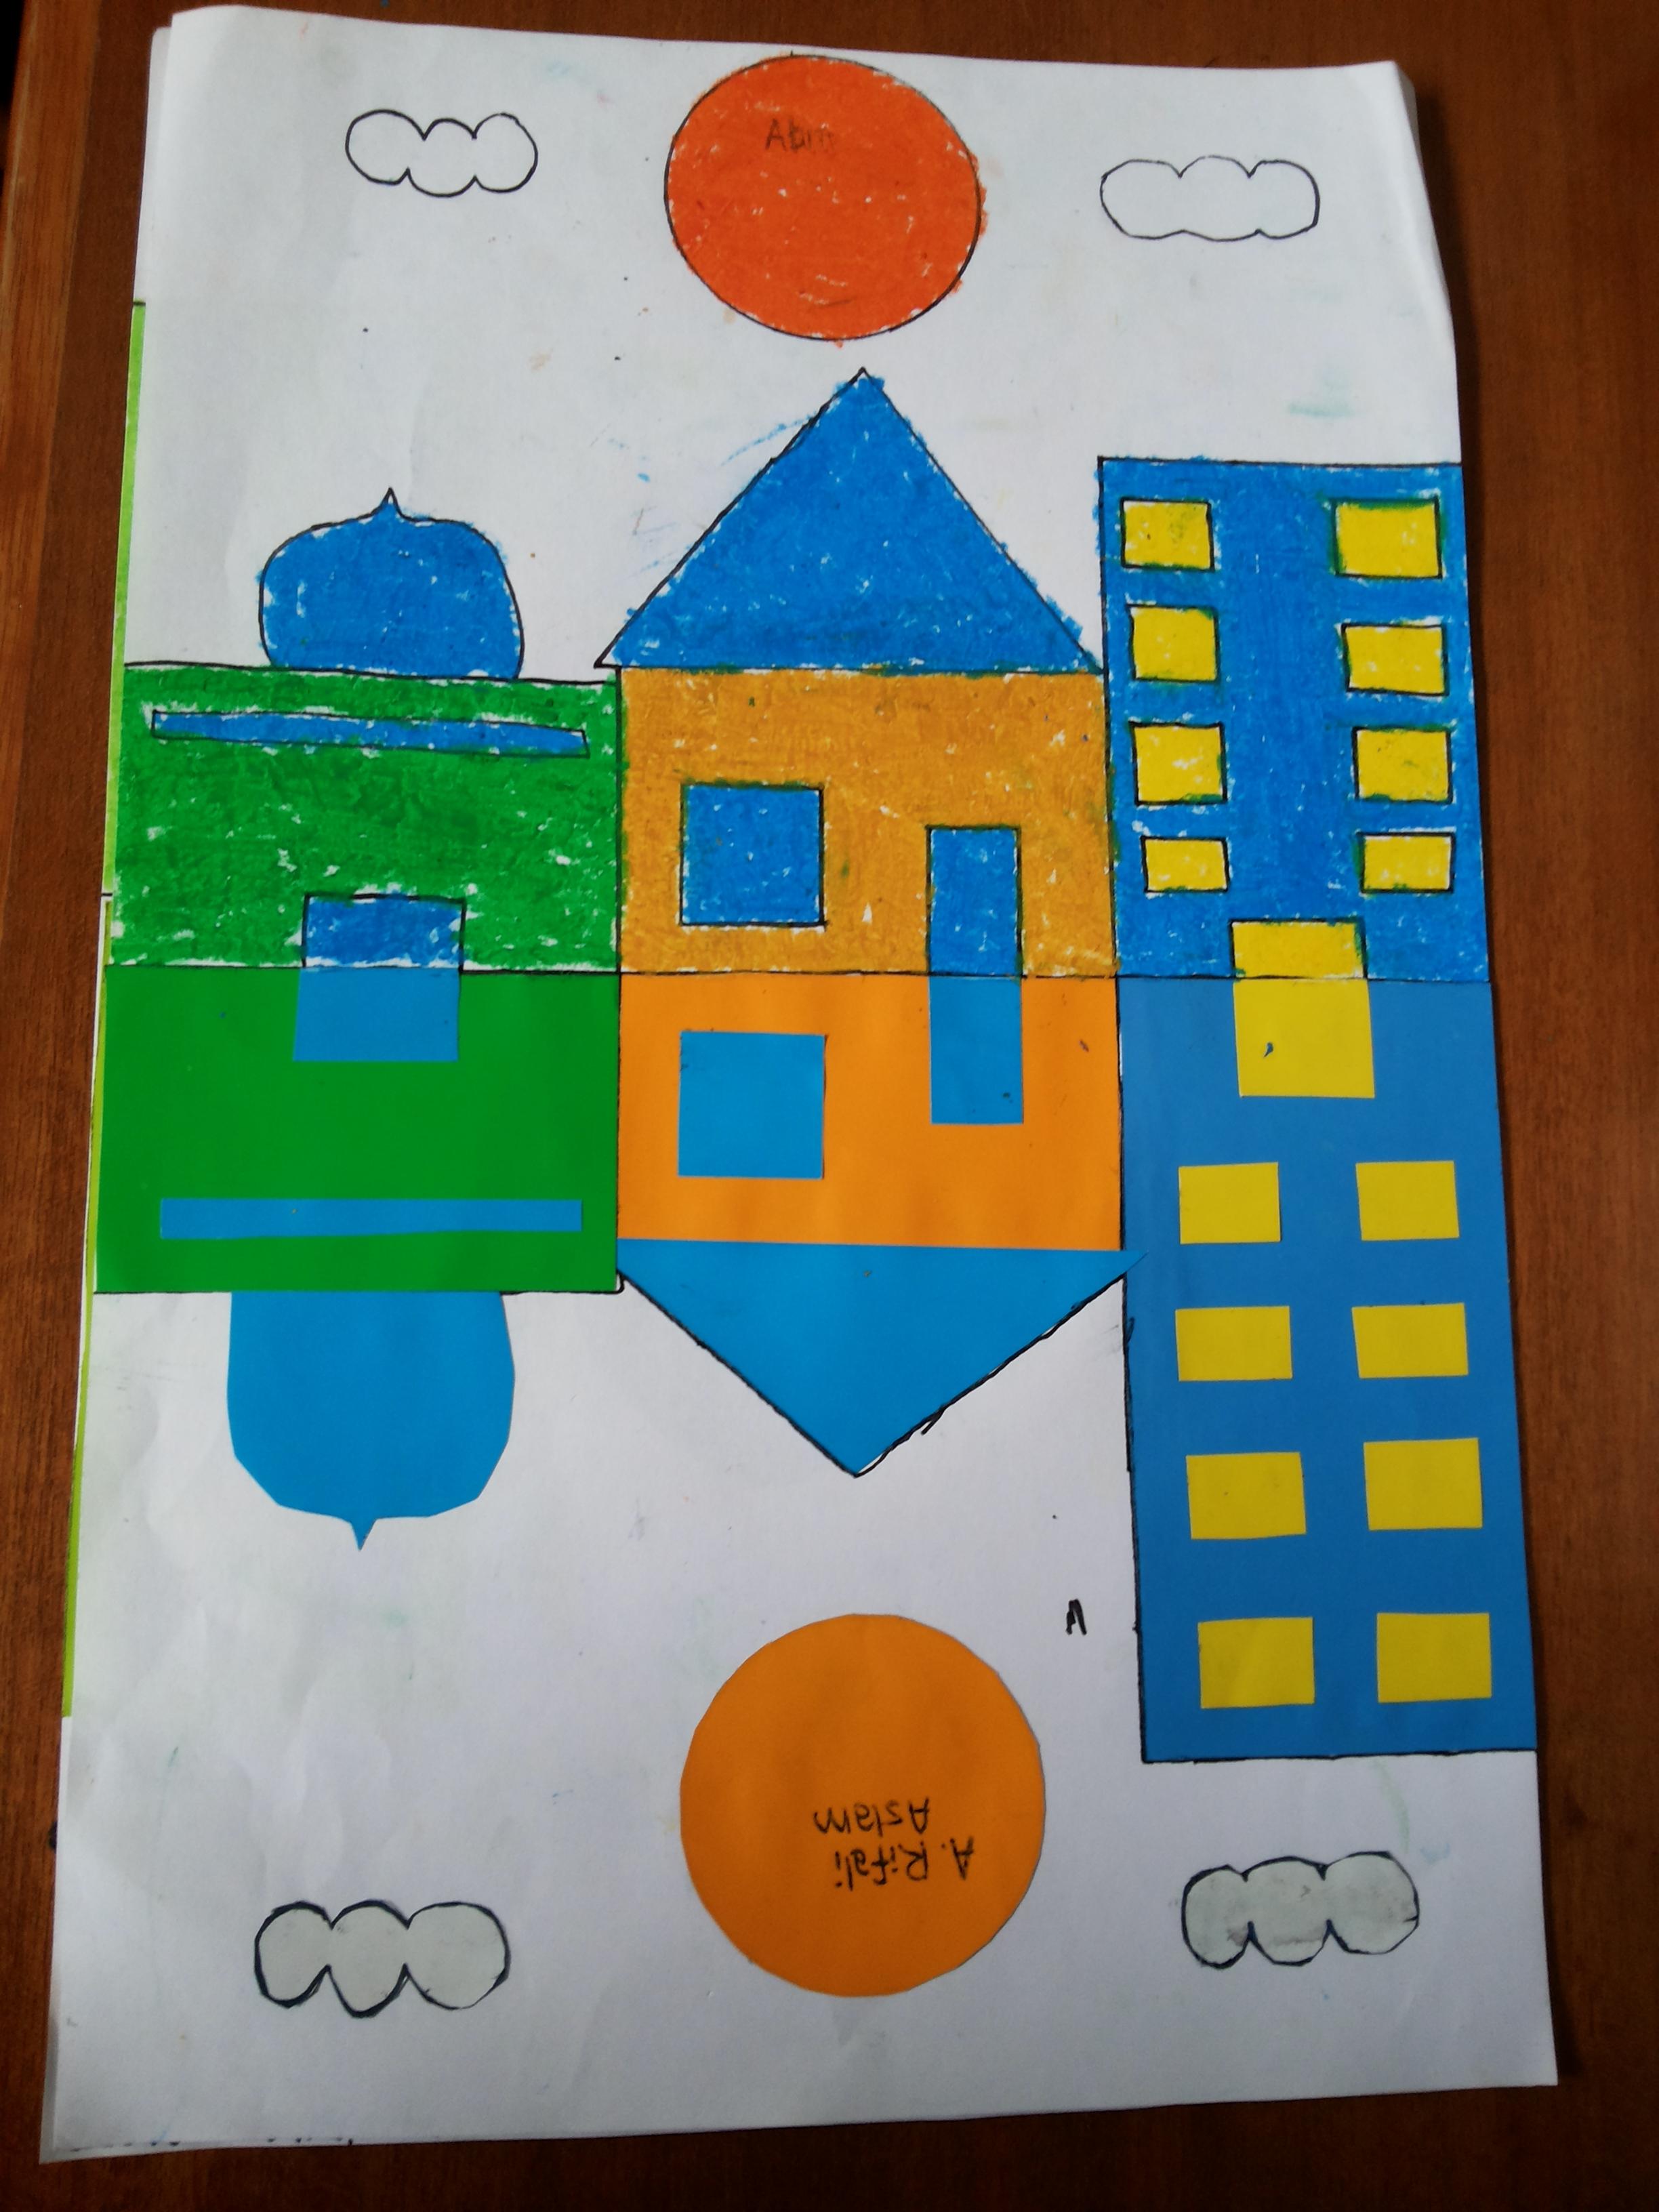 Cara Membuat Kolase Dari Kertas Origami : membuat, kolase, kertas, origami, Kelas, Aliyyah, Thabrani